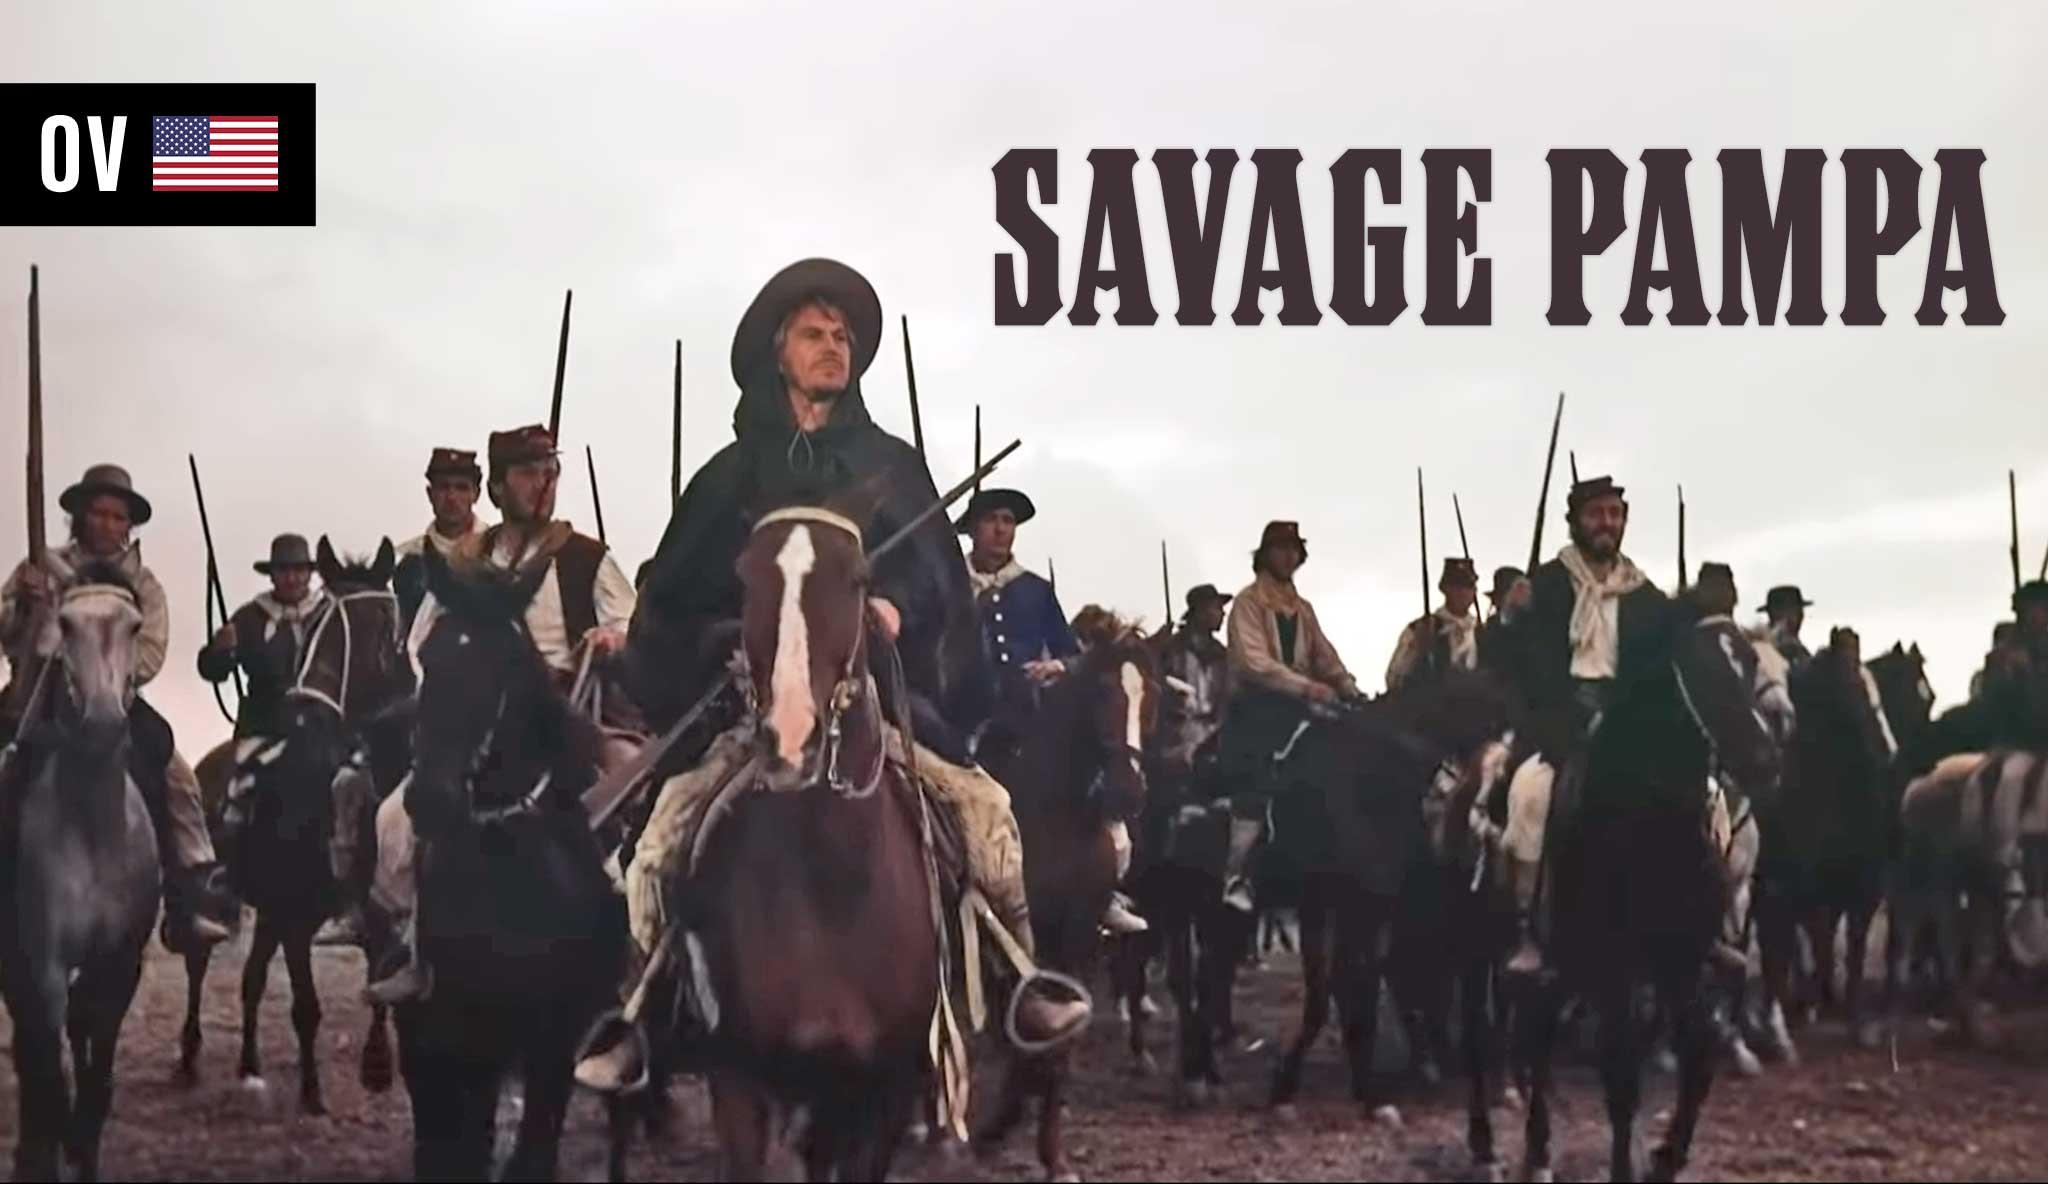 savage-pampa\header.jpg